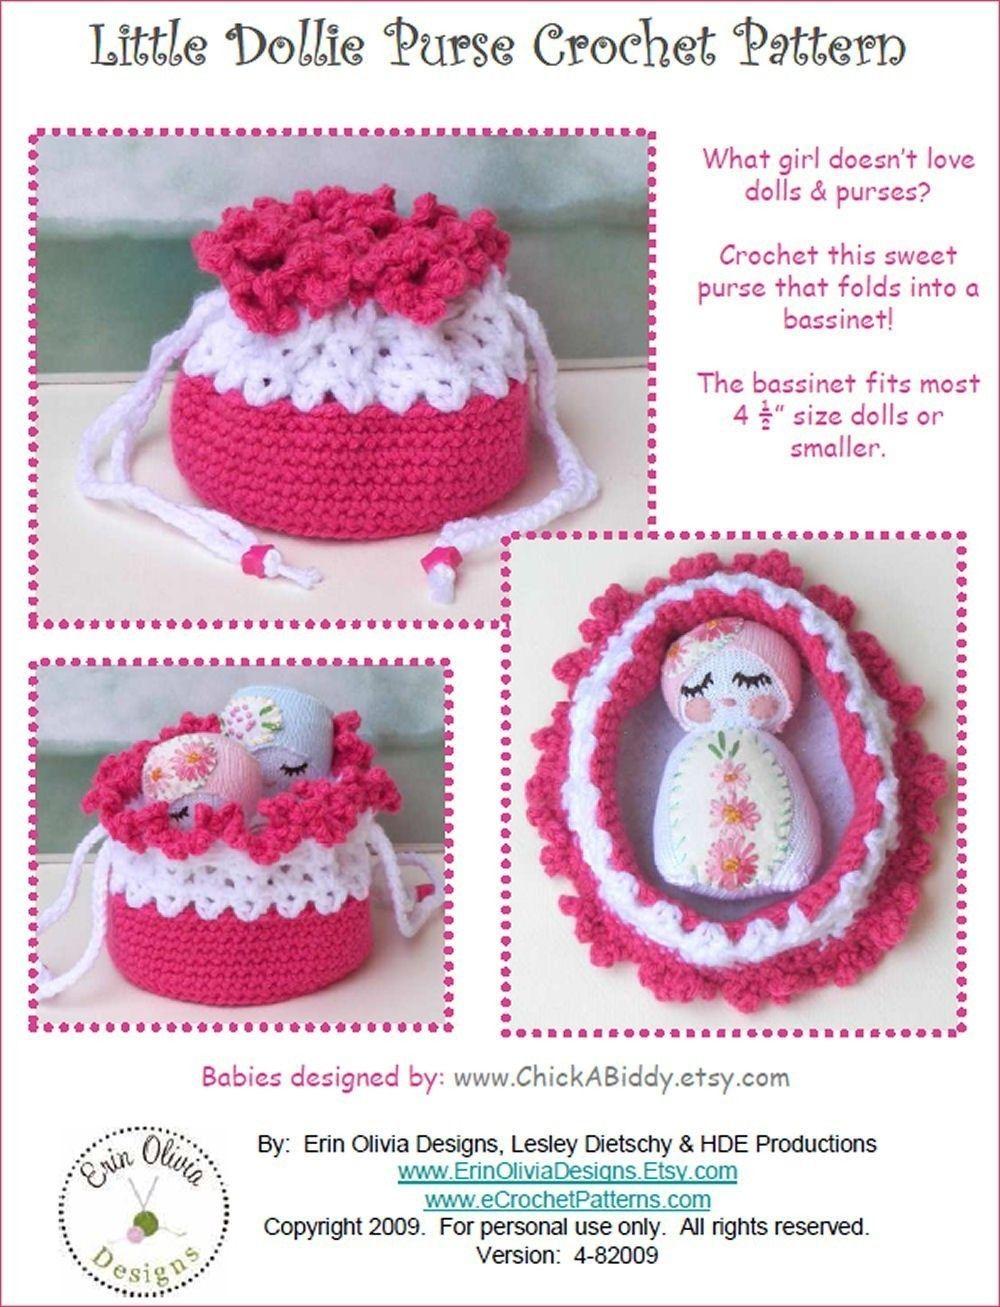 Crochet Cradle Bassinet Purse Pattern « BeadedSocks by Daisy Designs ...